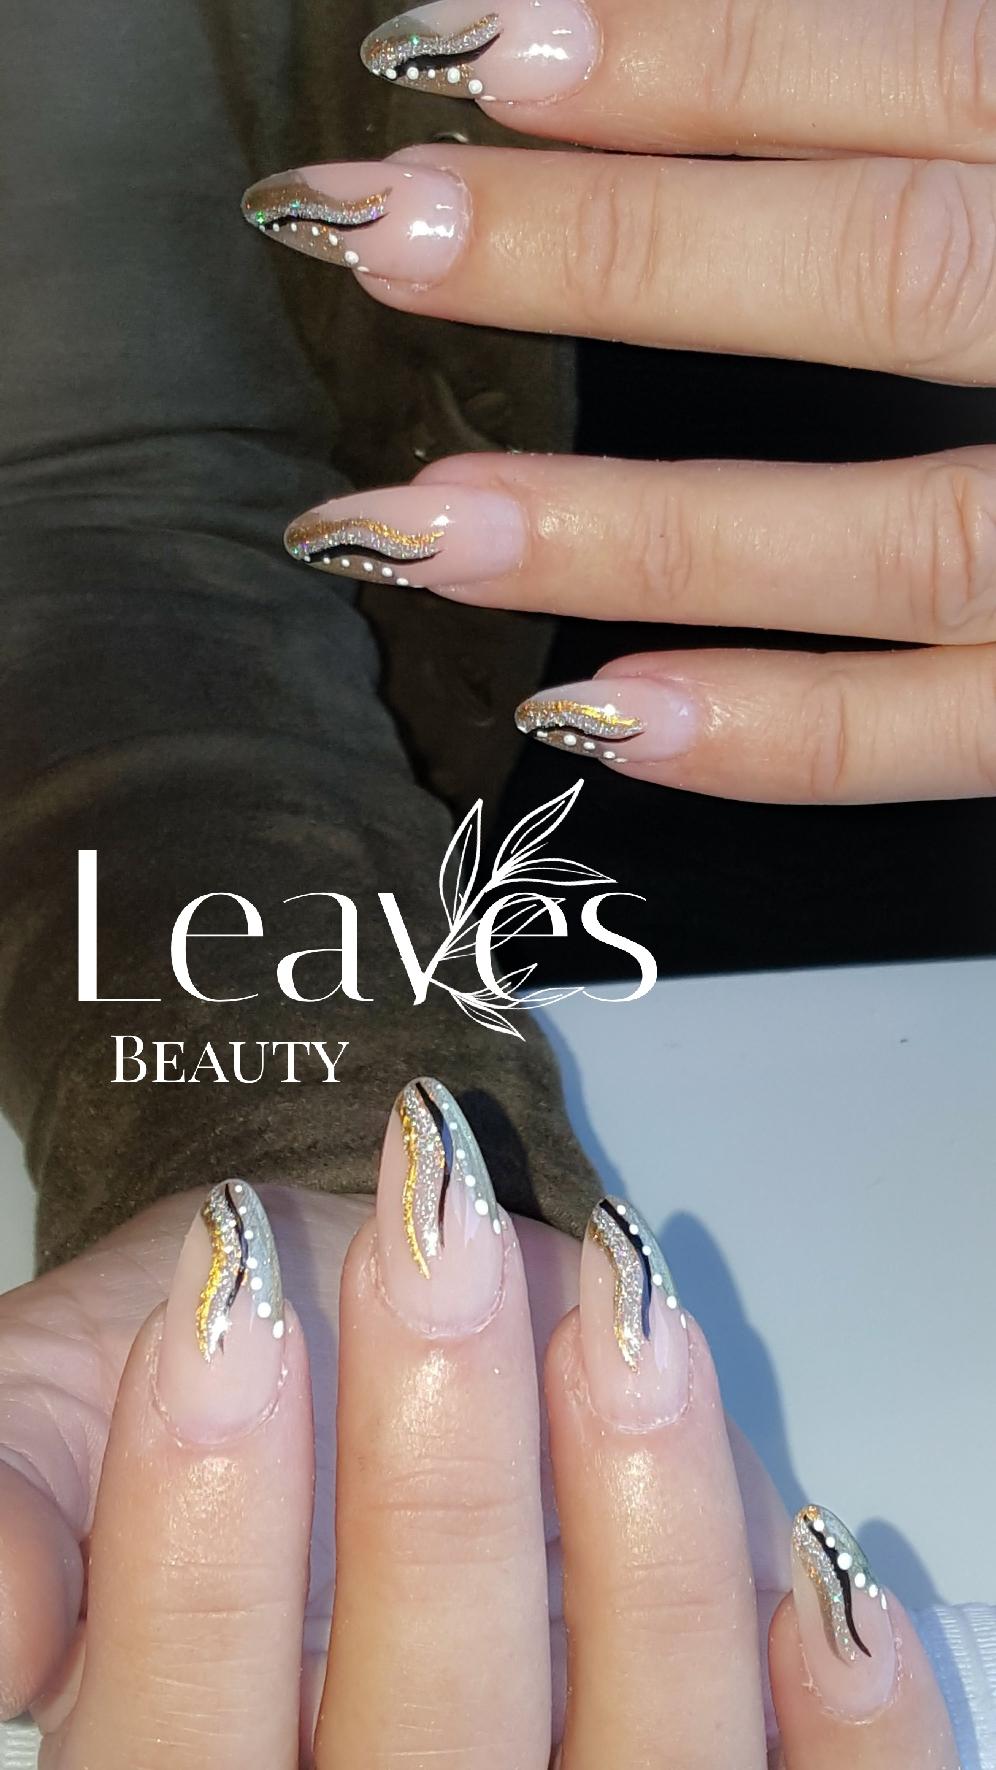 Acryl nagels met hand paint